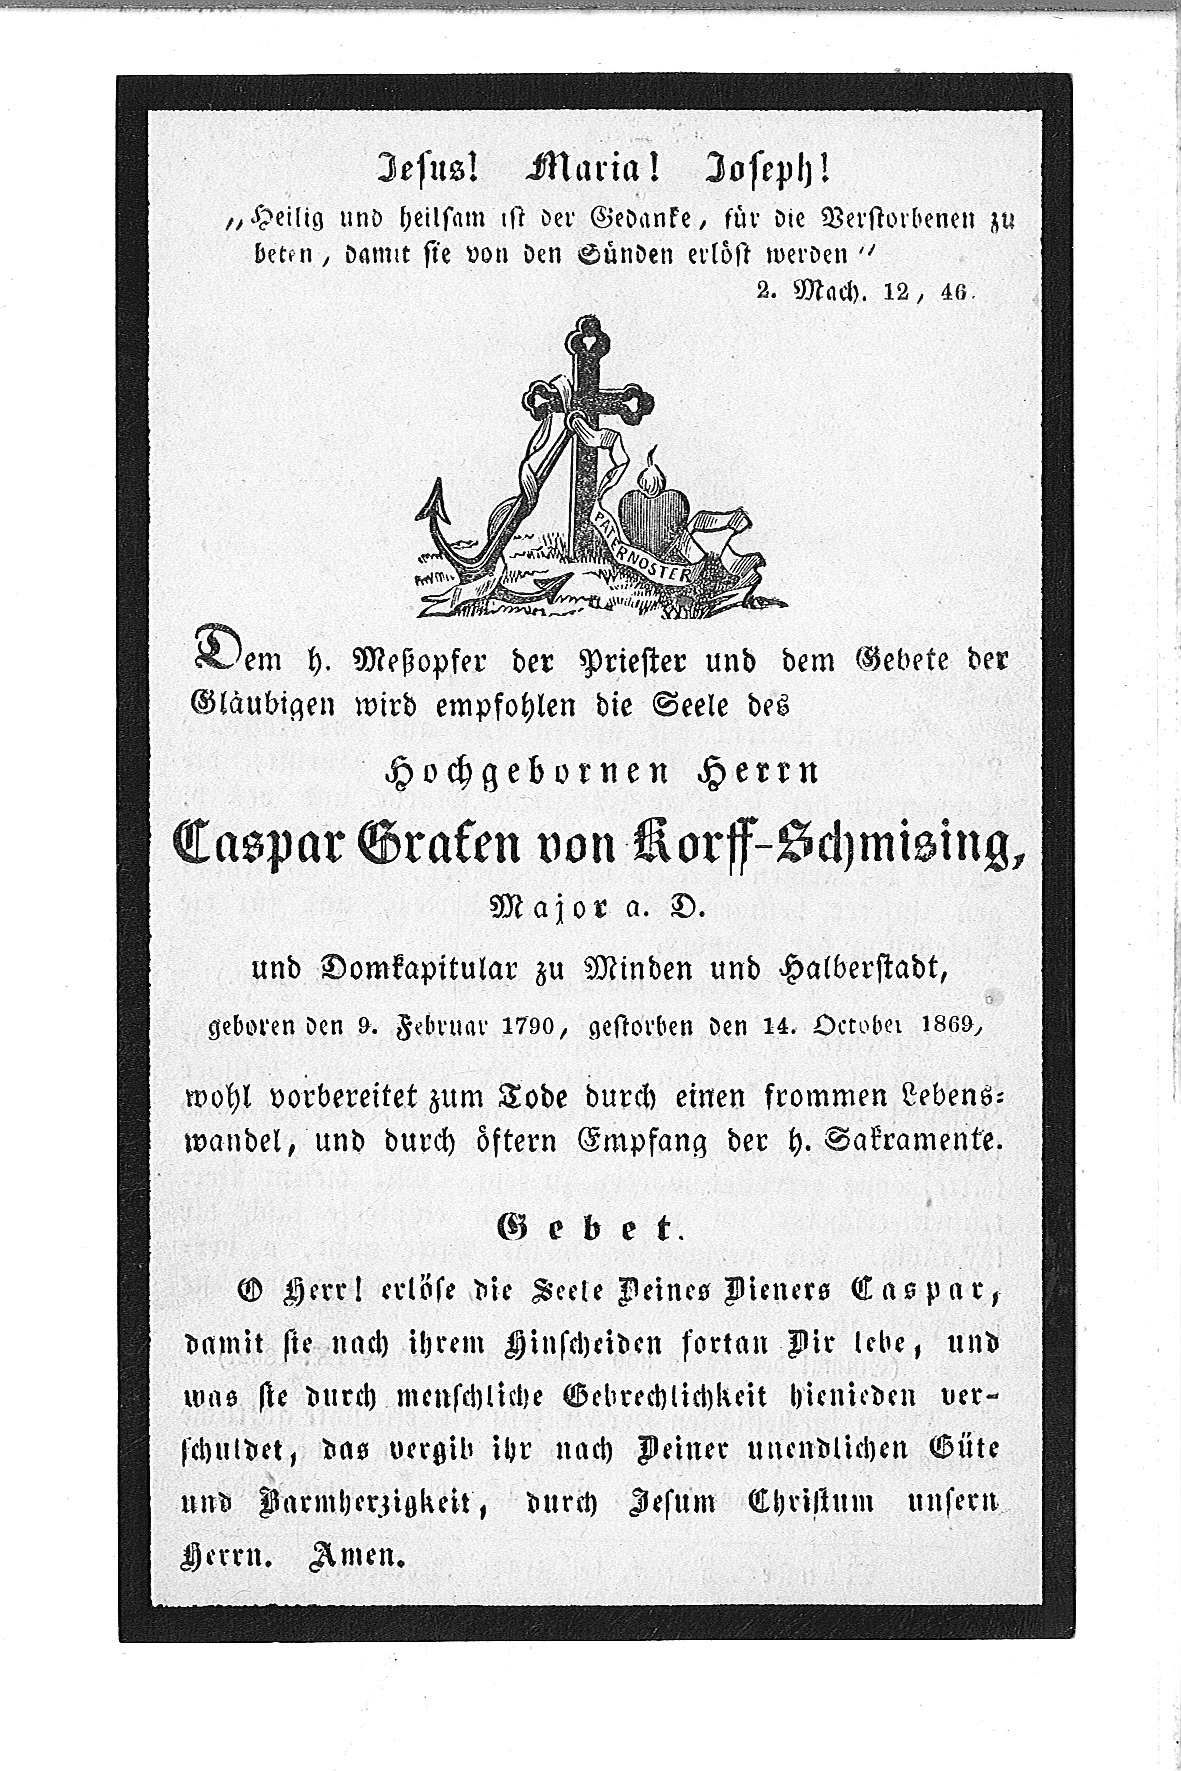 Caspar-(1869)-20120831102402_00052.jpg